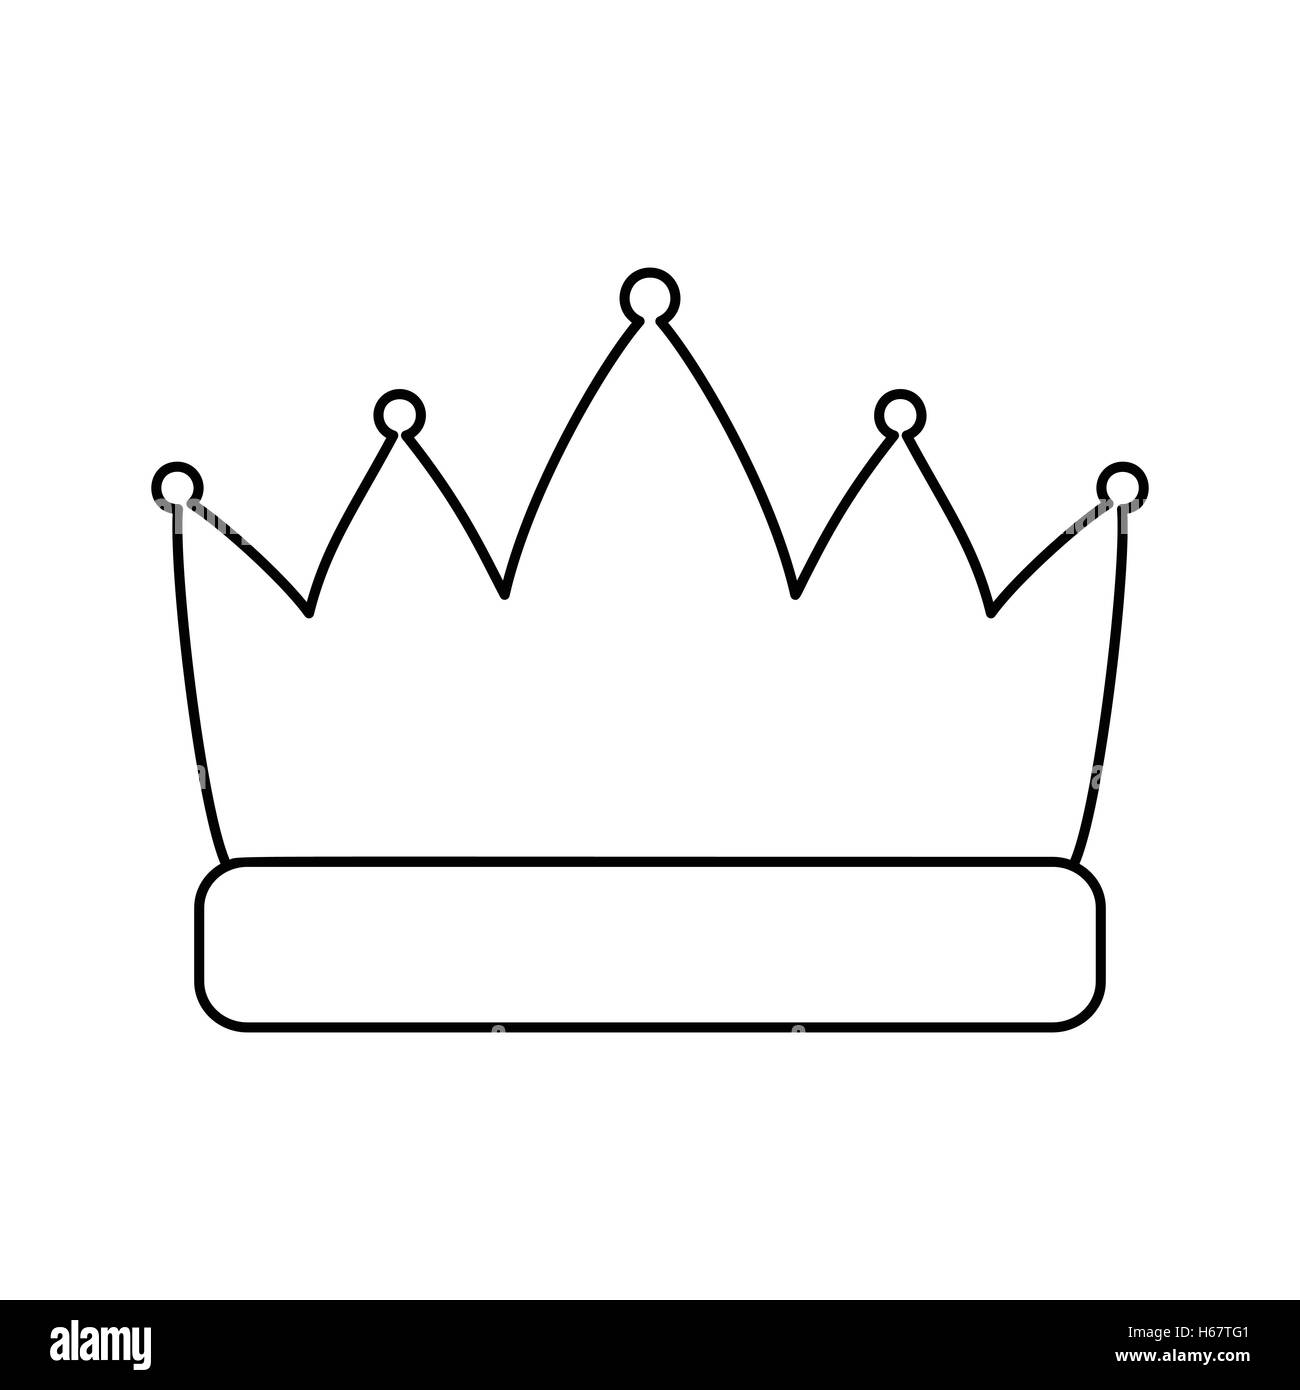 Crown line icon - Stock Vector